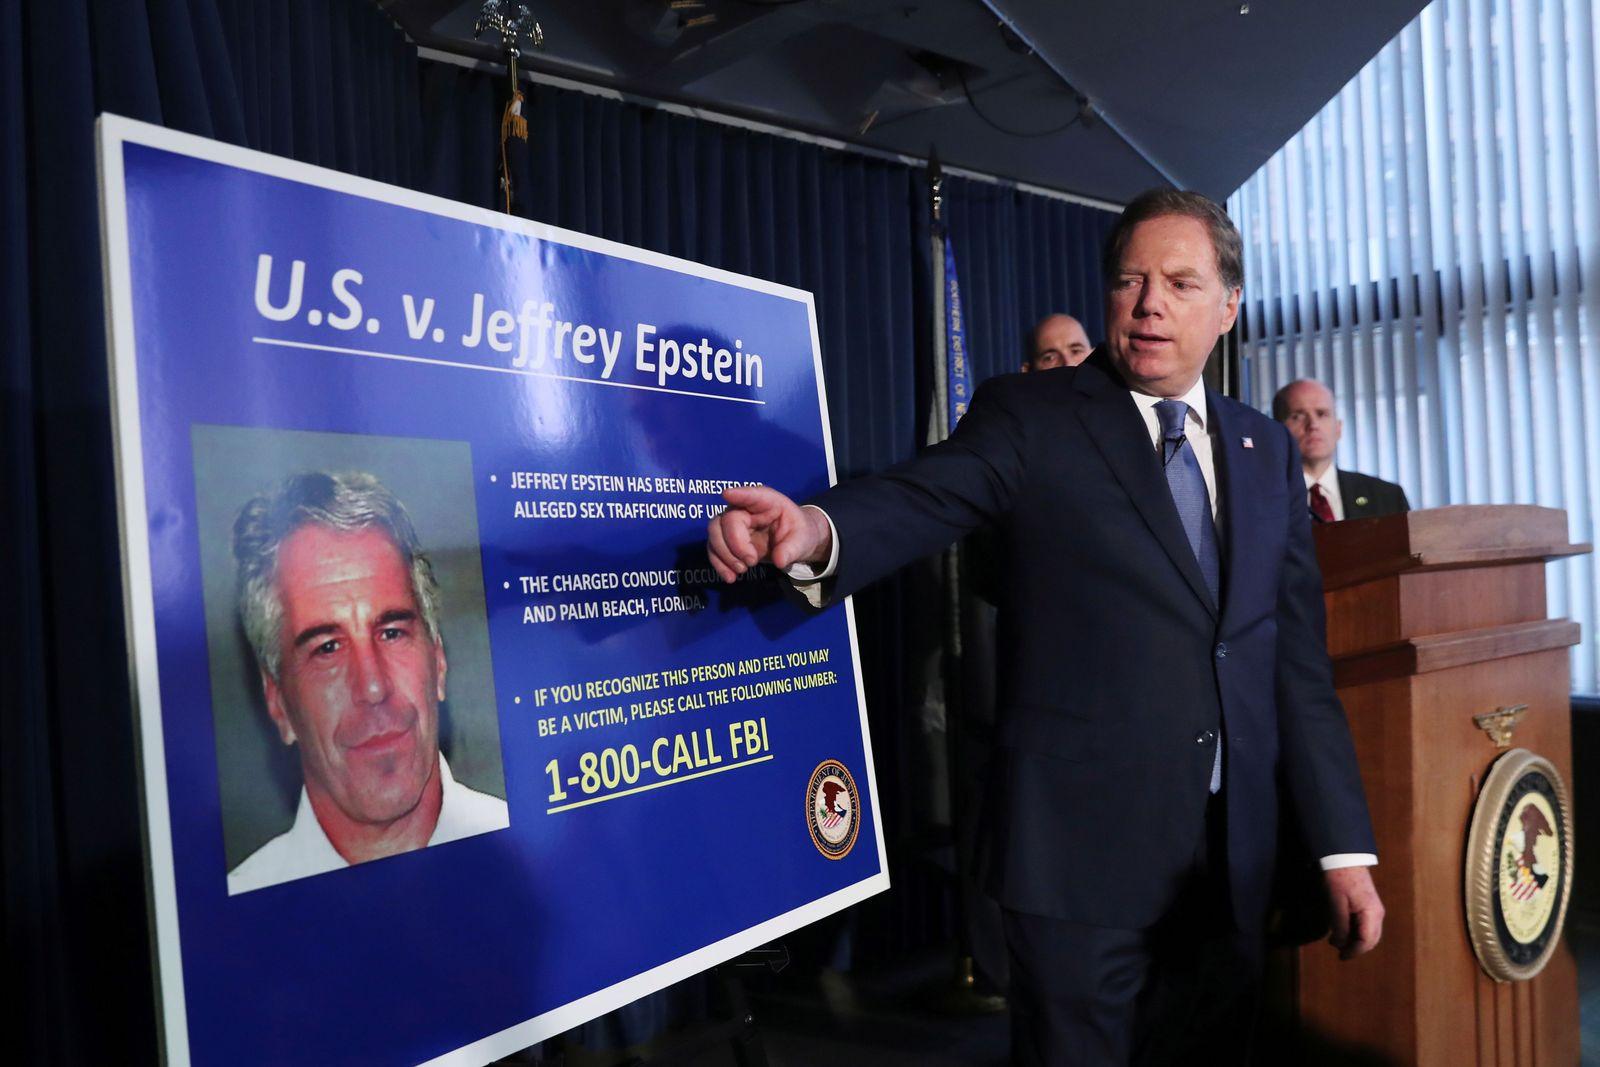 Epstein